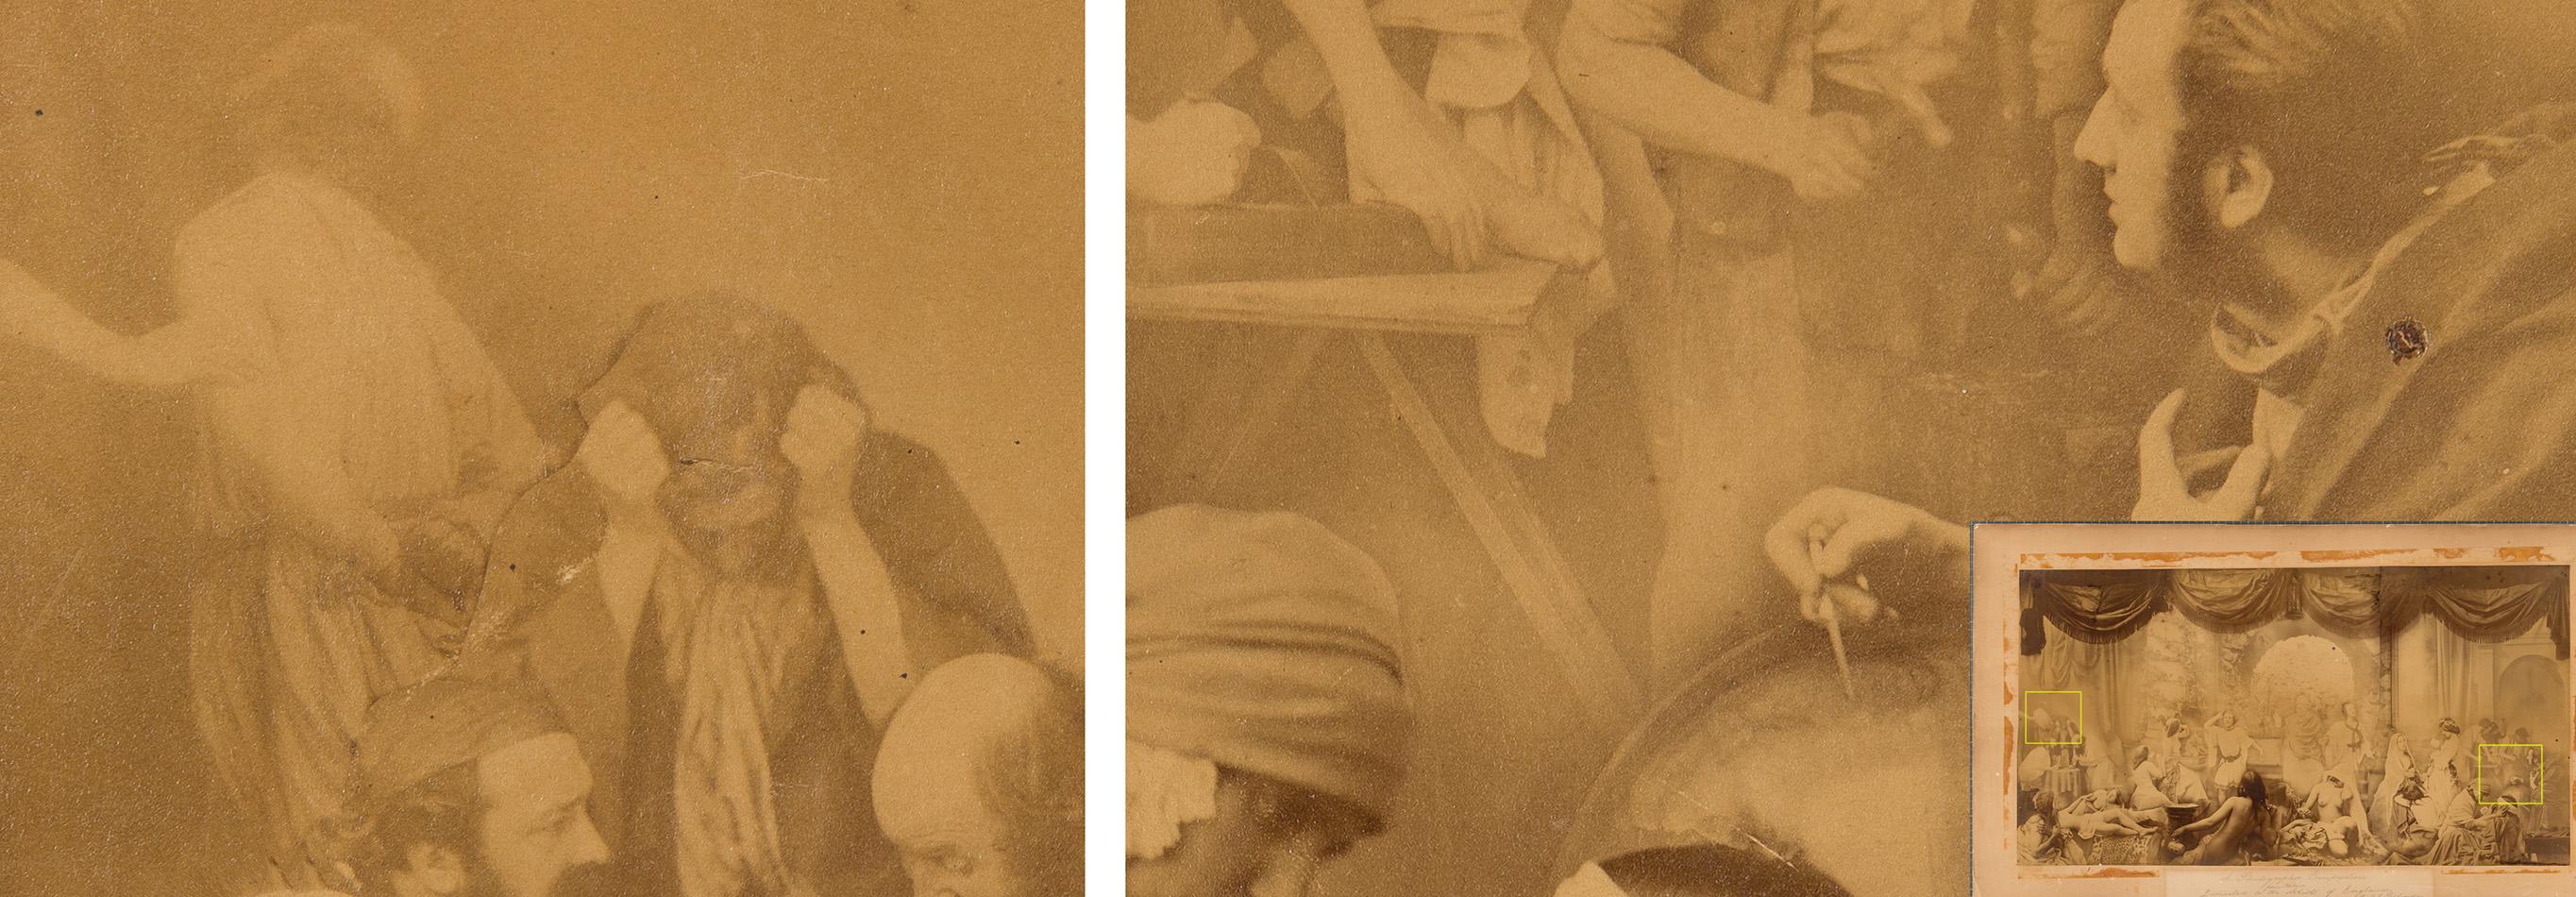 The Two Ways Of Life Oscar Gustav Rejlander additionally 5719169 moreover 9161052 also Historia De La Fotografia as well 2921308. on oscar rejlander two ways of life